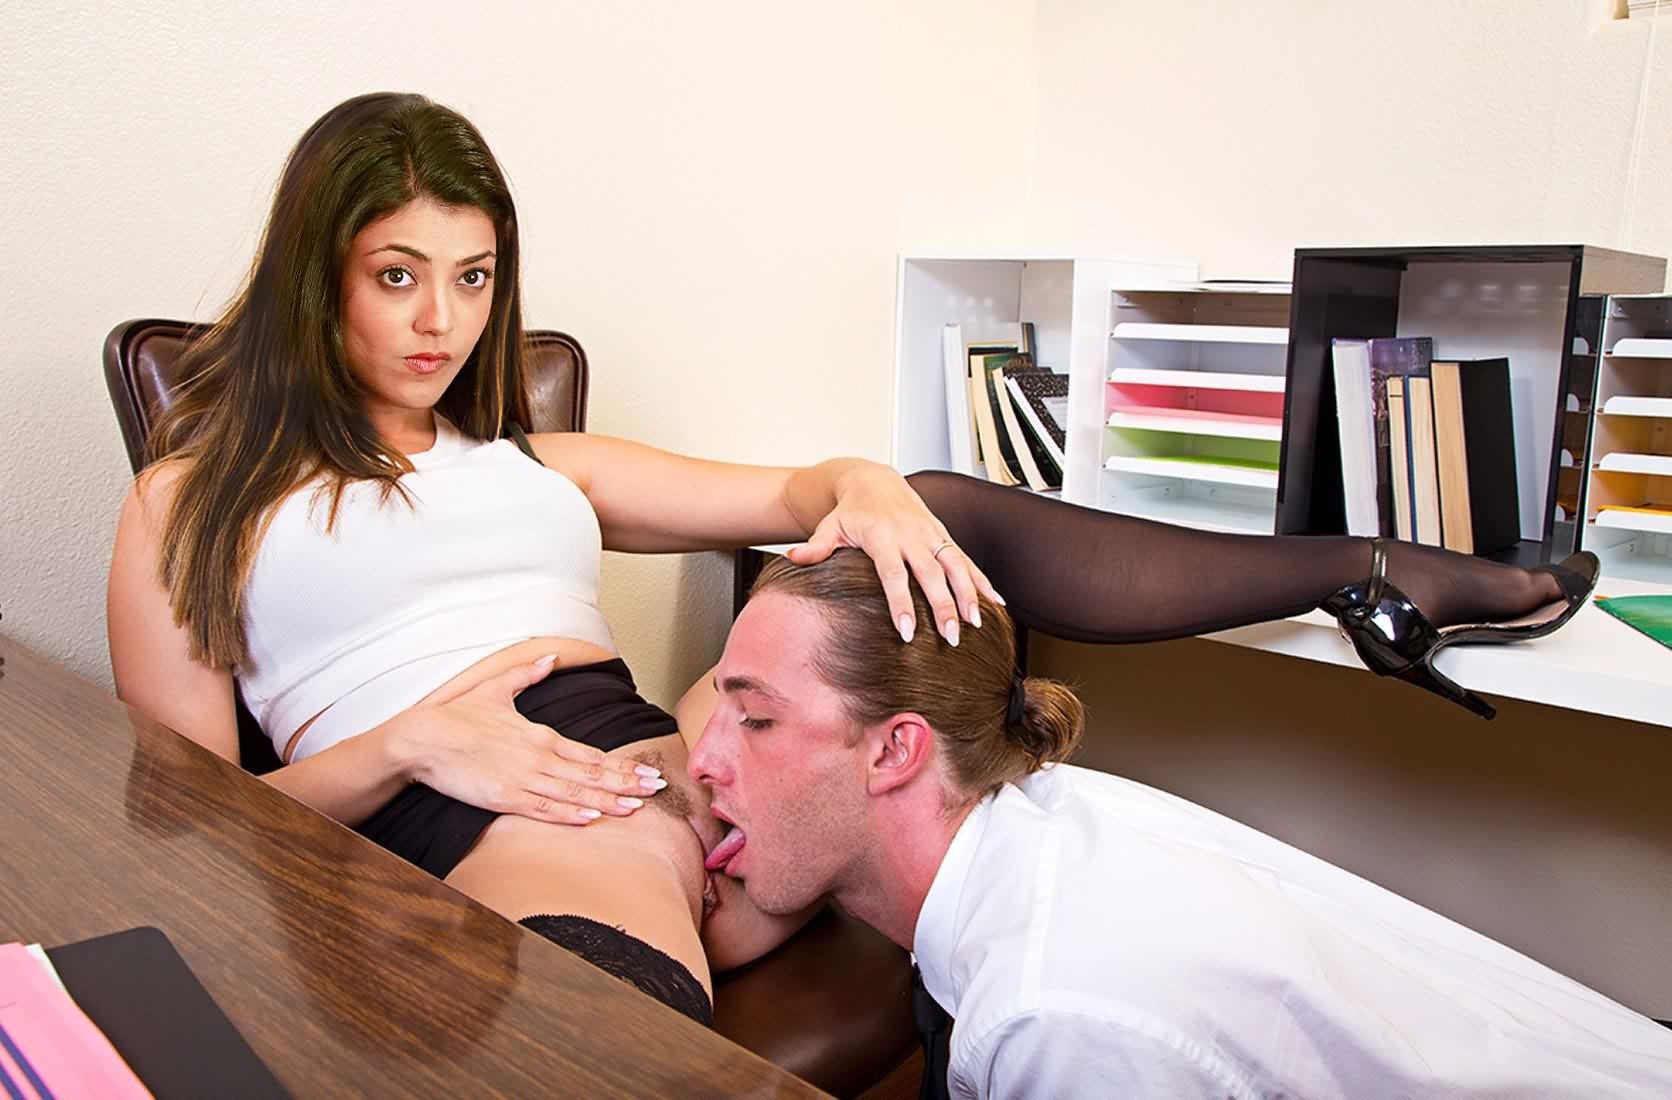 xxx Kajal Agarwal sex 2 - Kajal Aggarwal Nude Fake Sexy Porn Photos